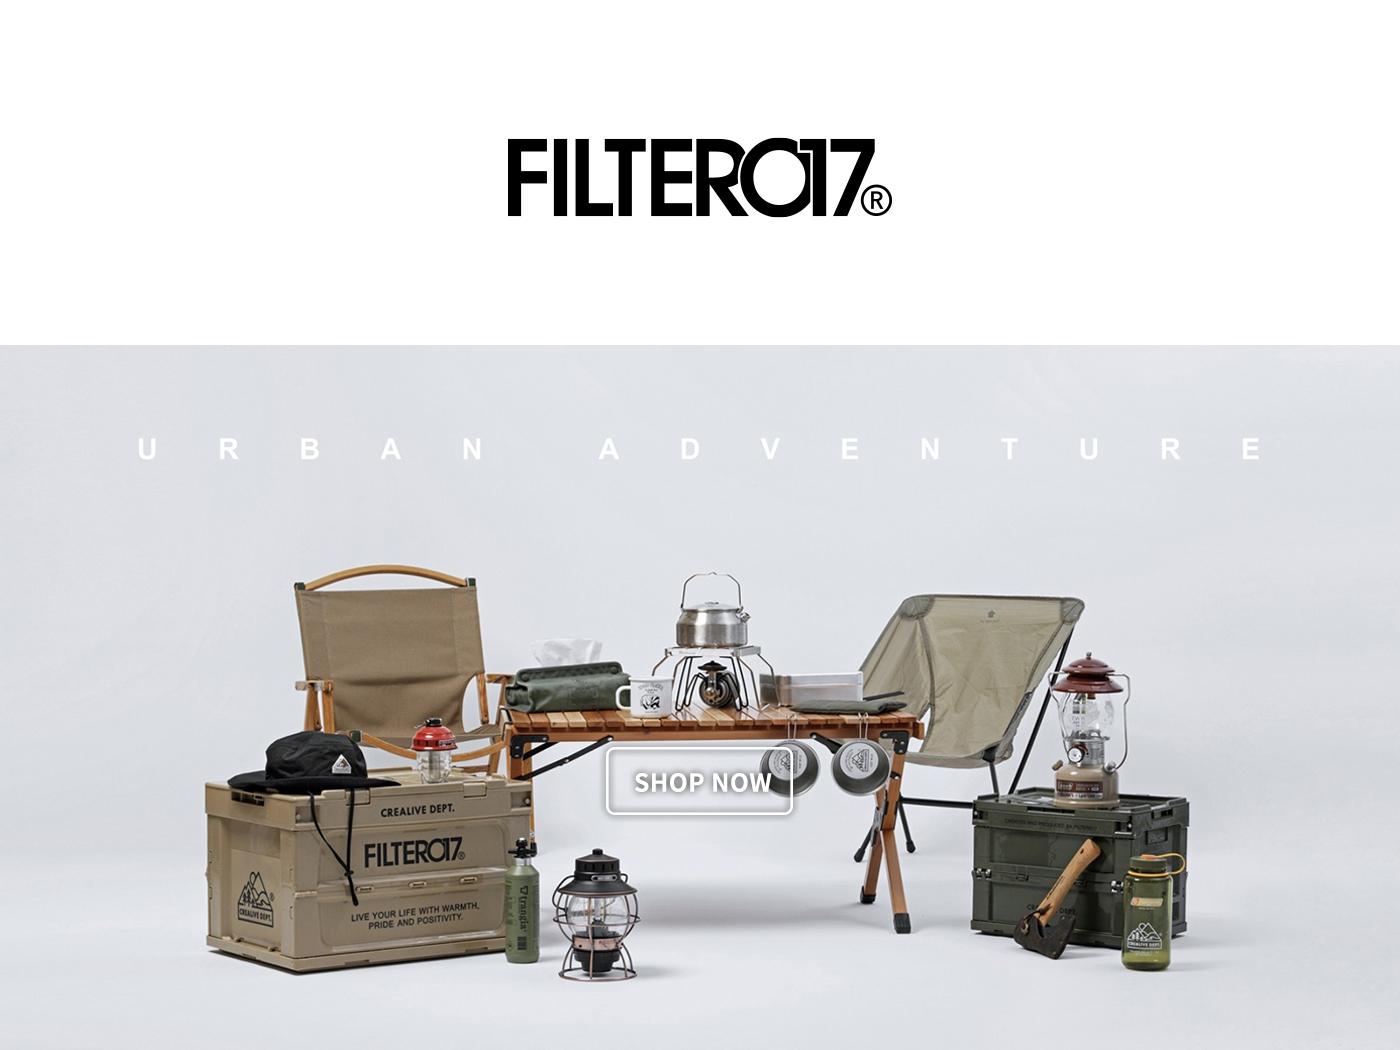 filter017,filter017 收納箱,filter017 台北,filter017帽子,filter017 crealive dept,台灣品牌,台灣設計品牌,台灣服裝品牌